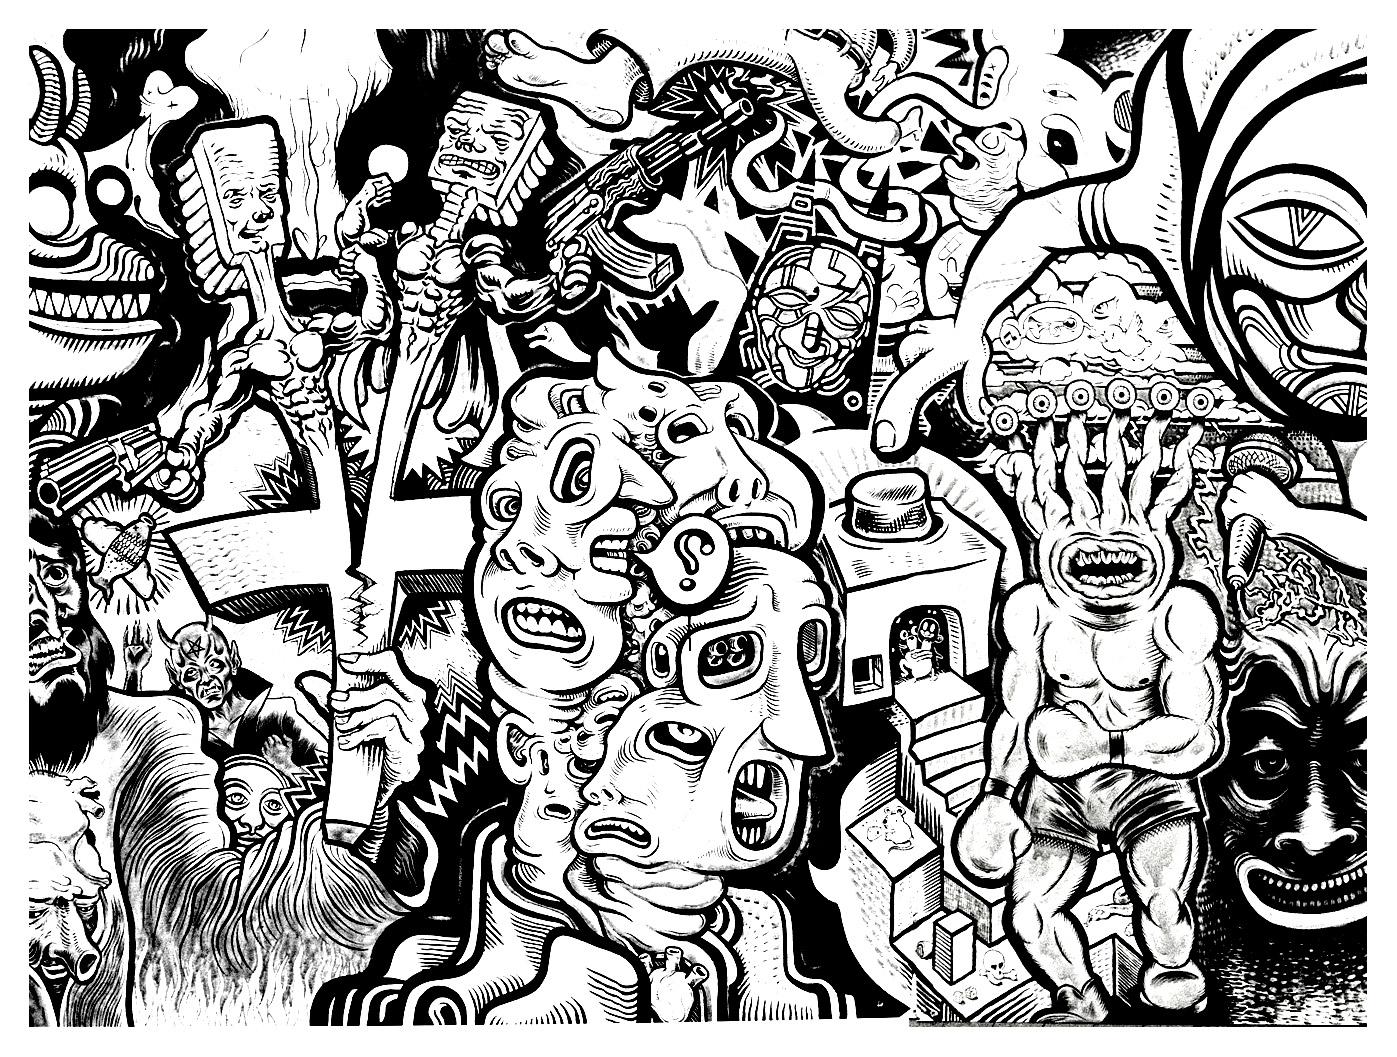 Graffiti strassenkunst 75469 - Graffiti / Straßenkunst - Malbuch Fur ...